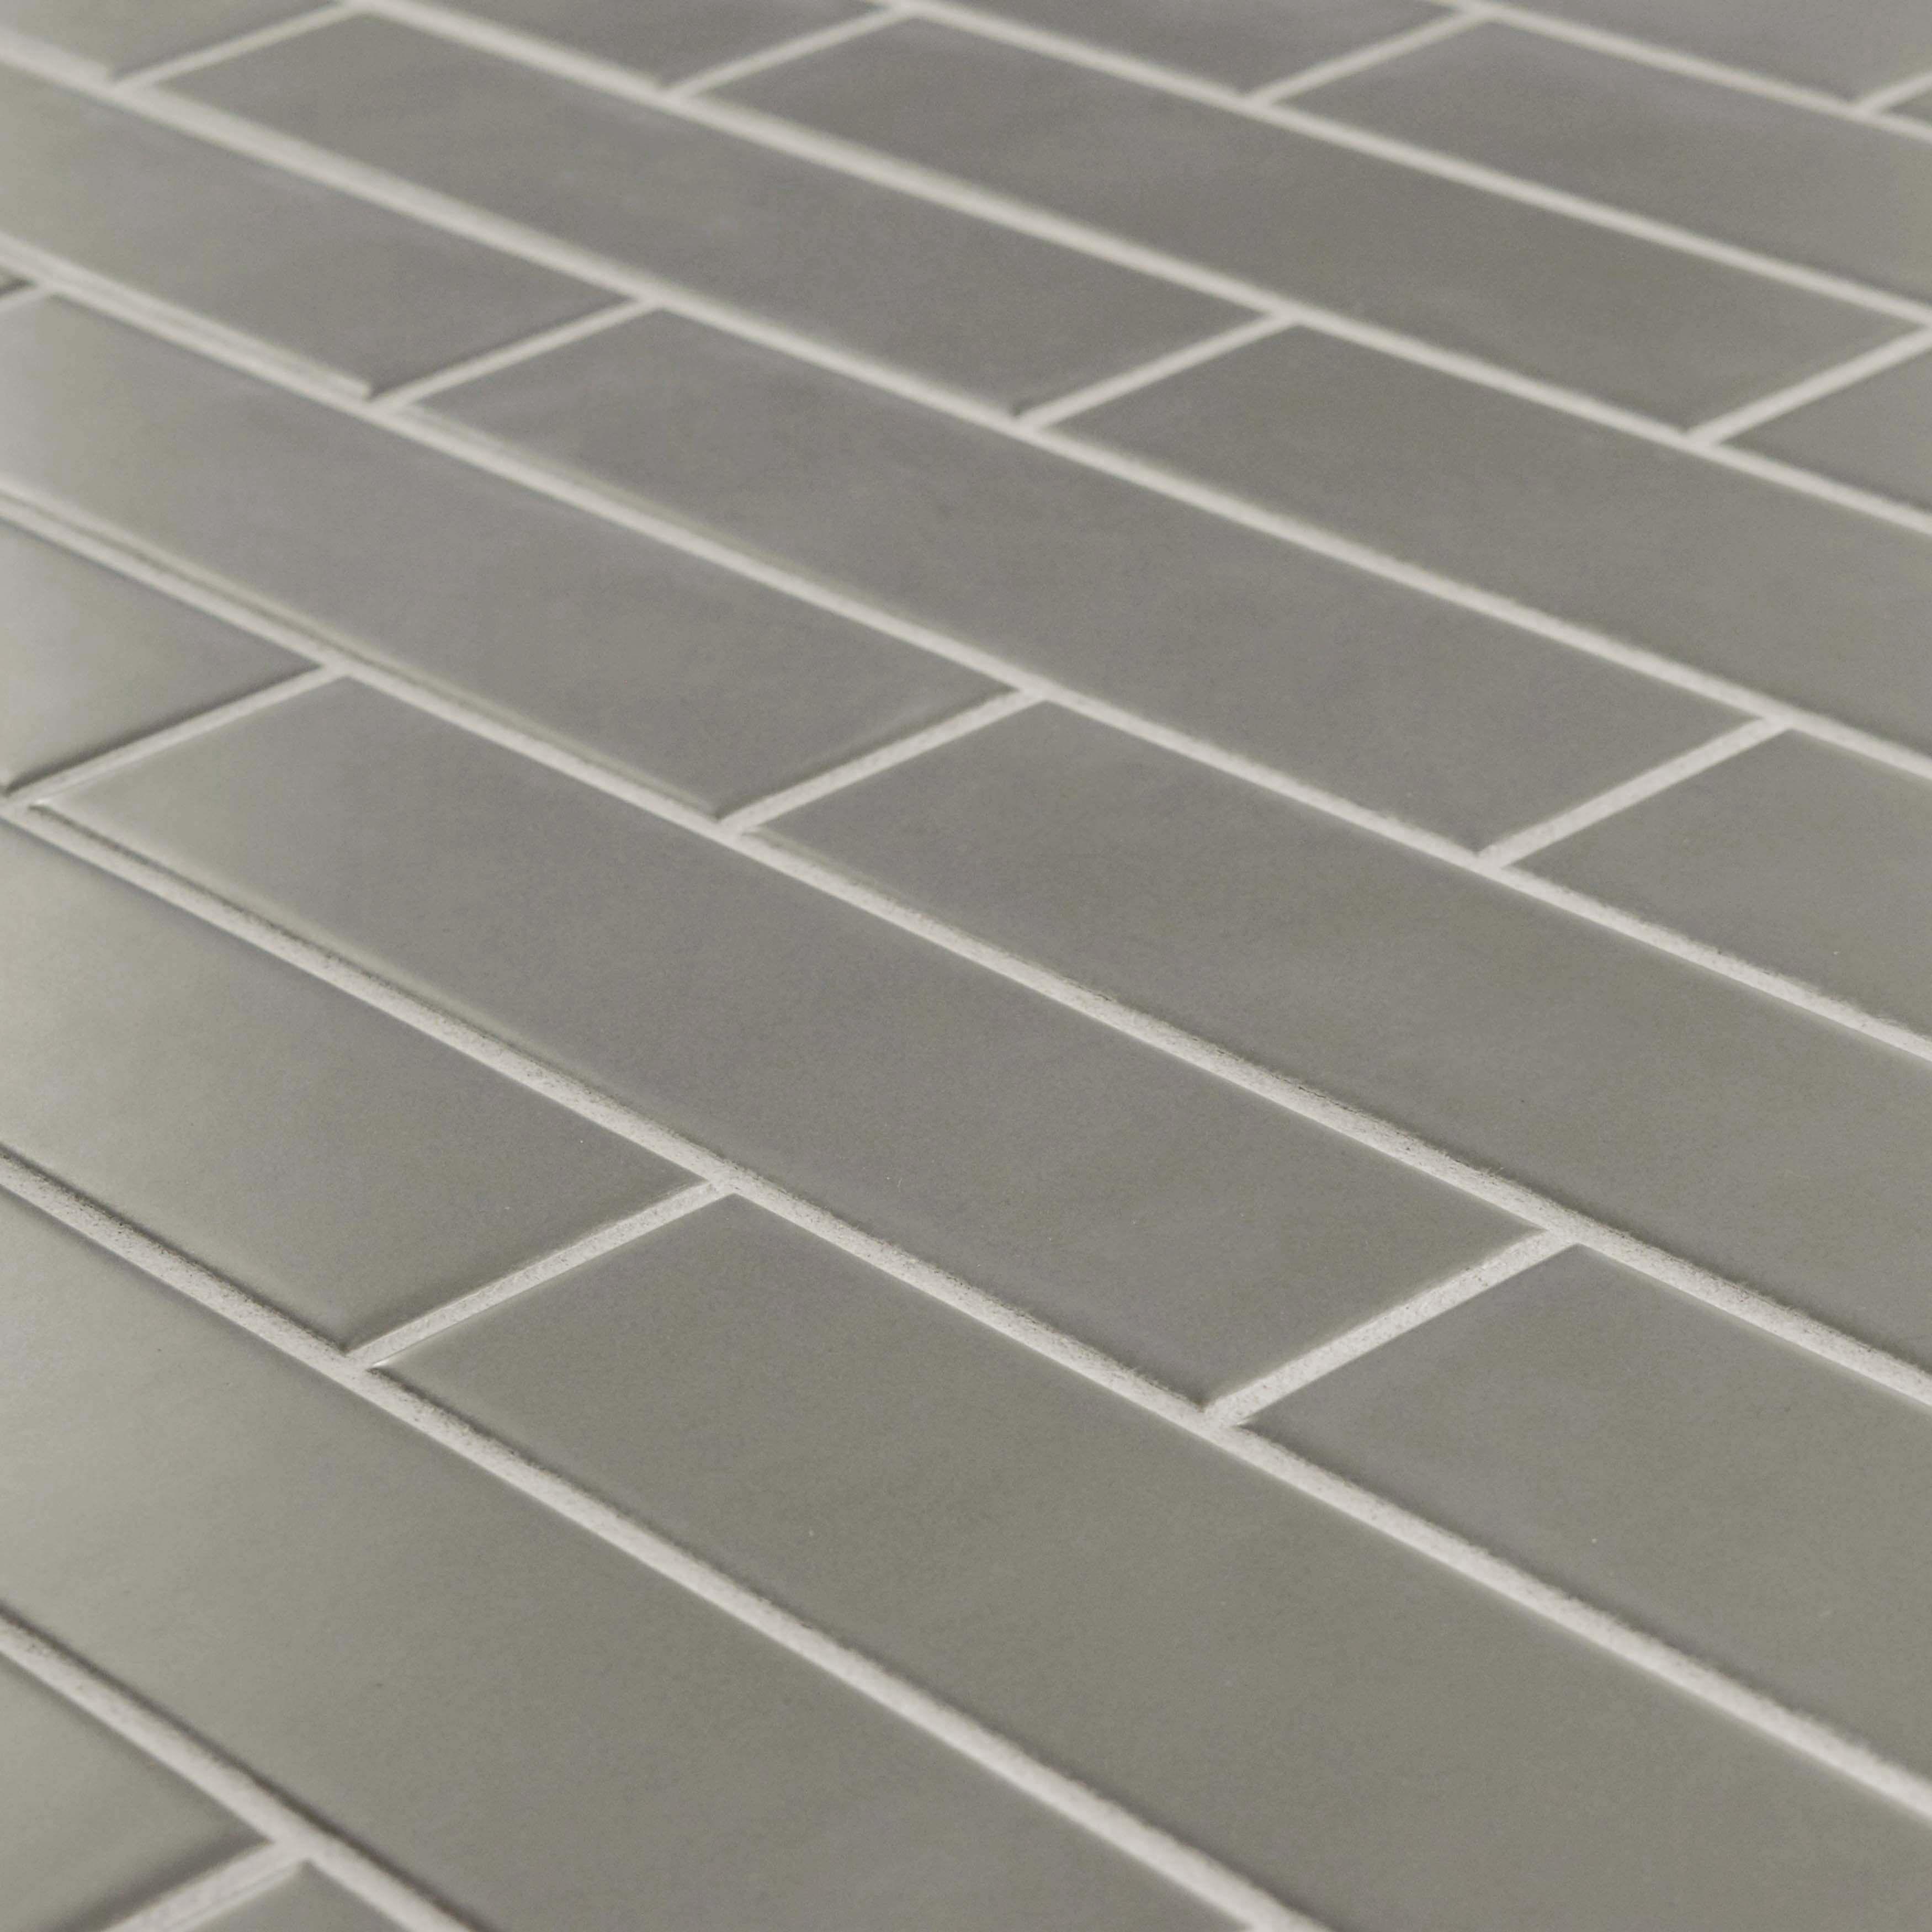 Elitetile Retro Soho 175 X 775 Porcelain Subway Tile In Matte